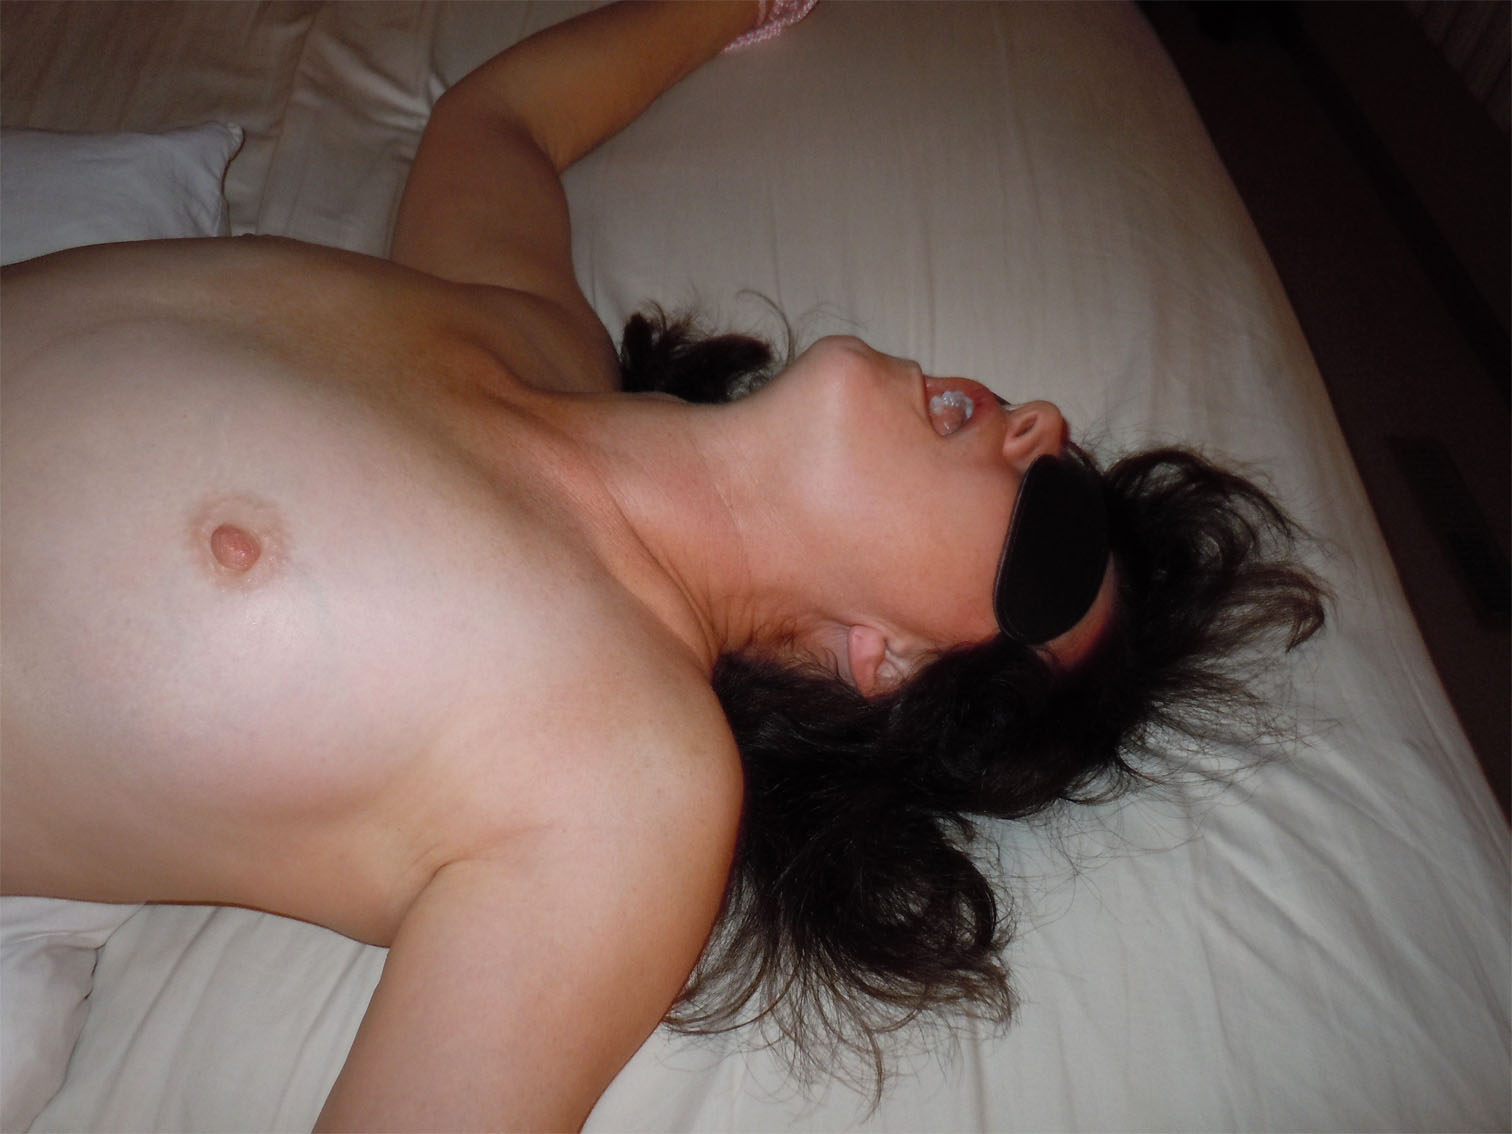 Drunk wife pics fucking